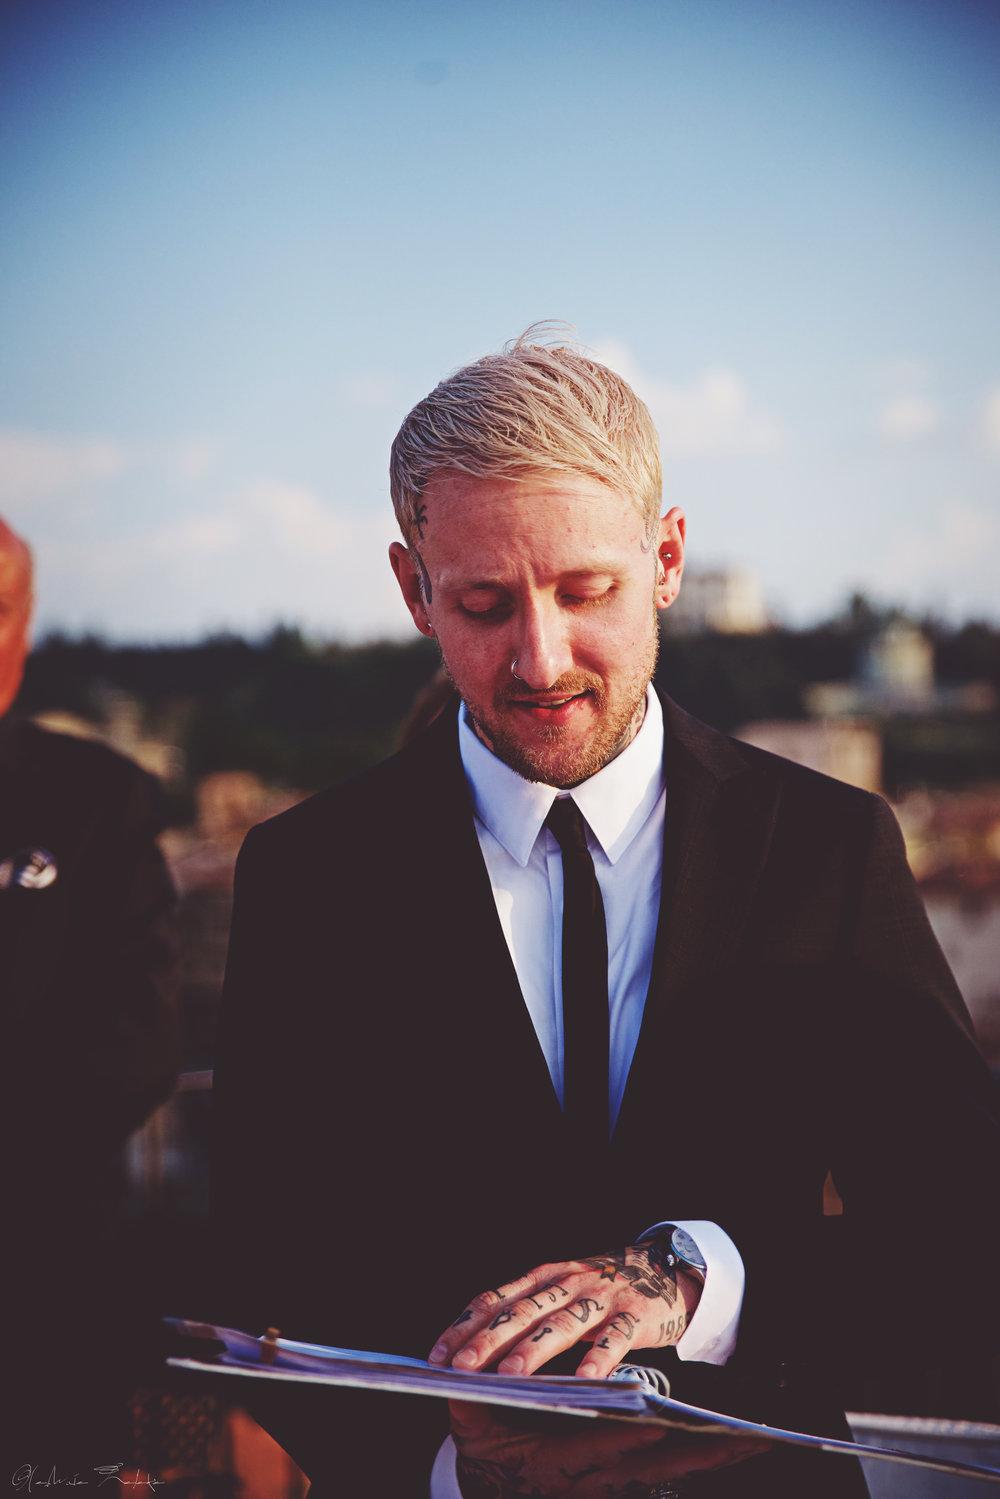 Cassidy-Ryan-Wedding-Florence-71.jpg